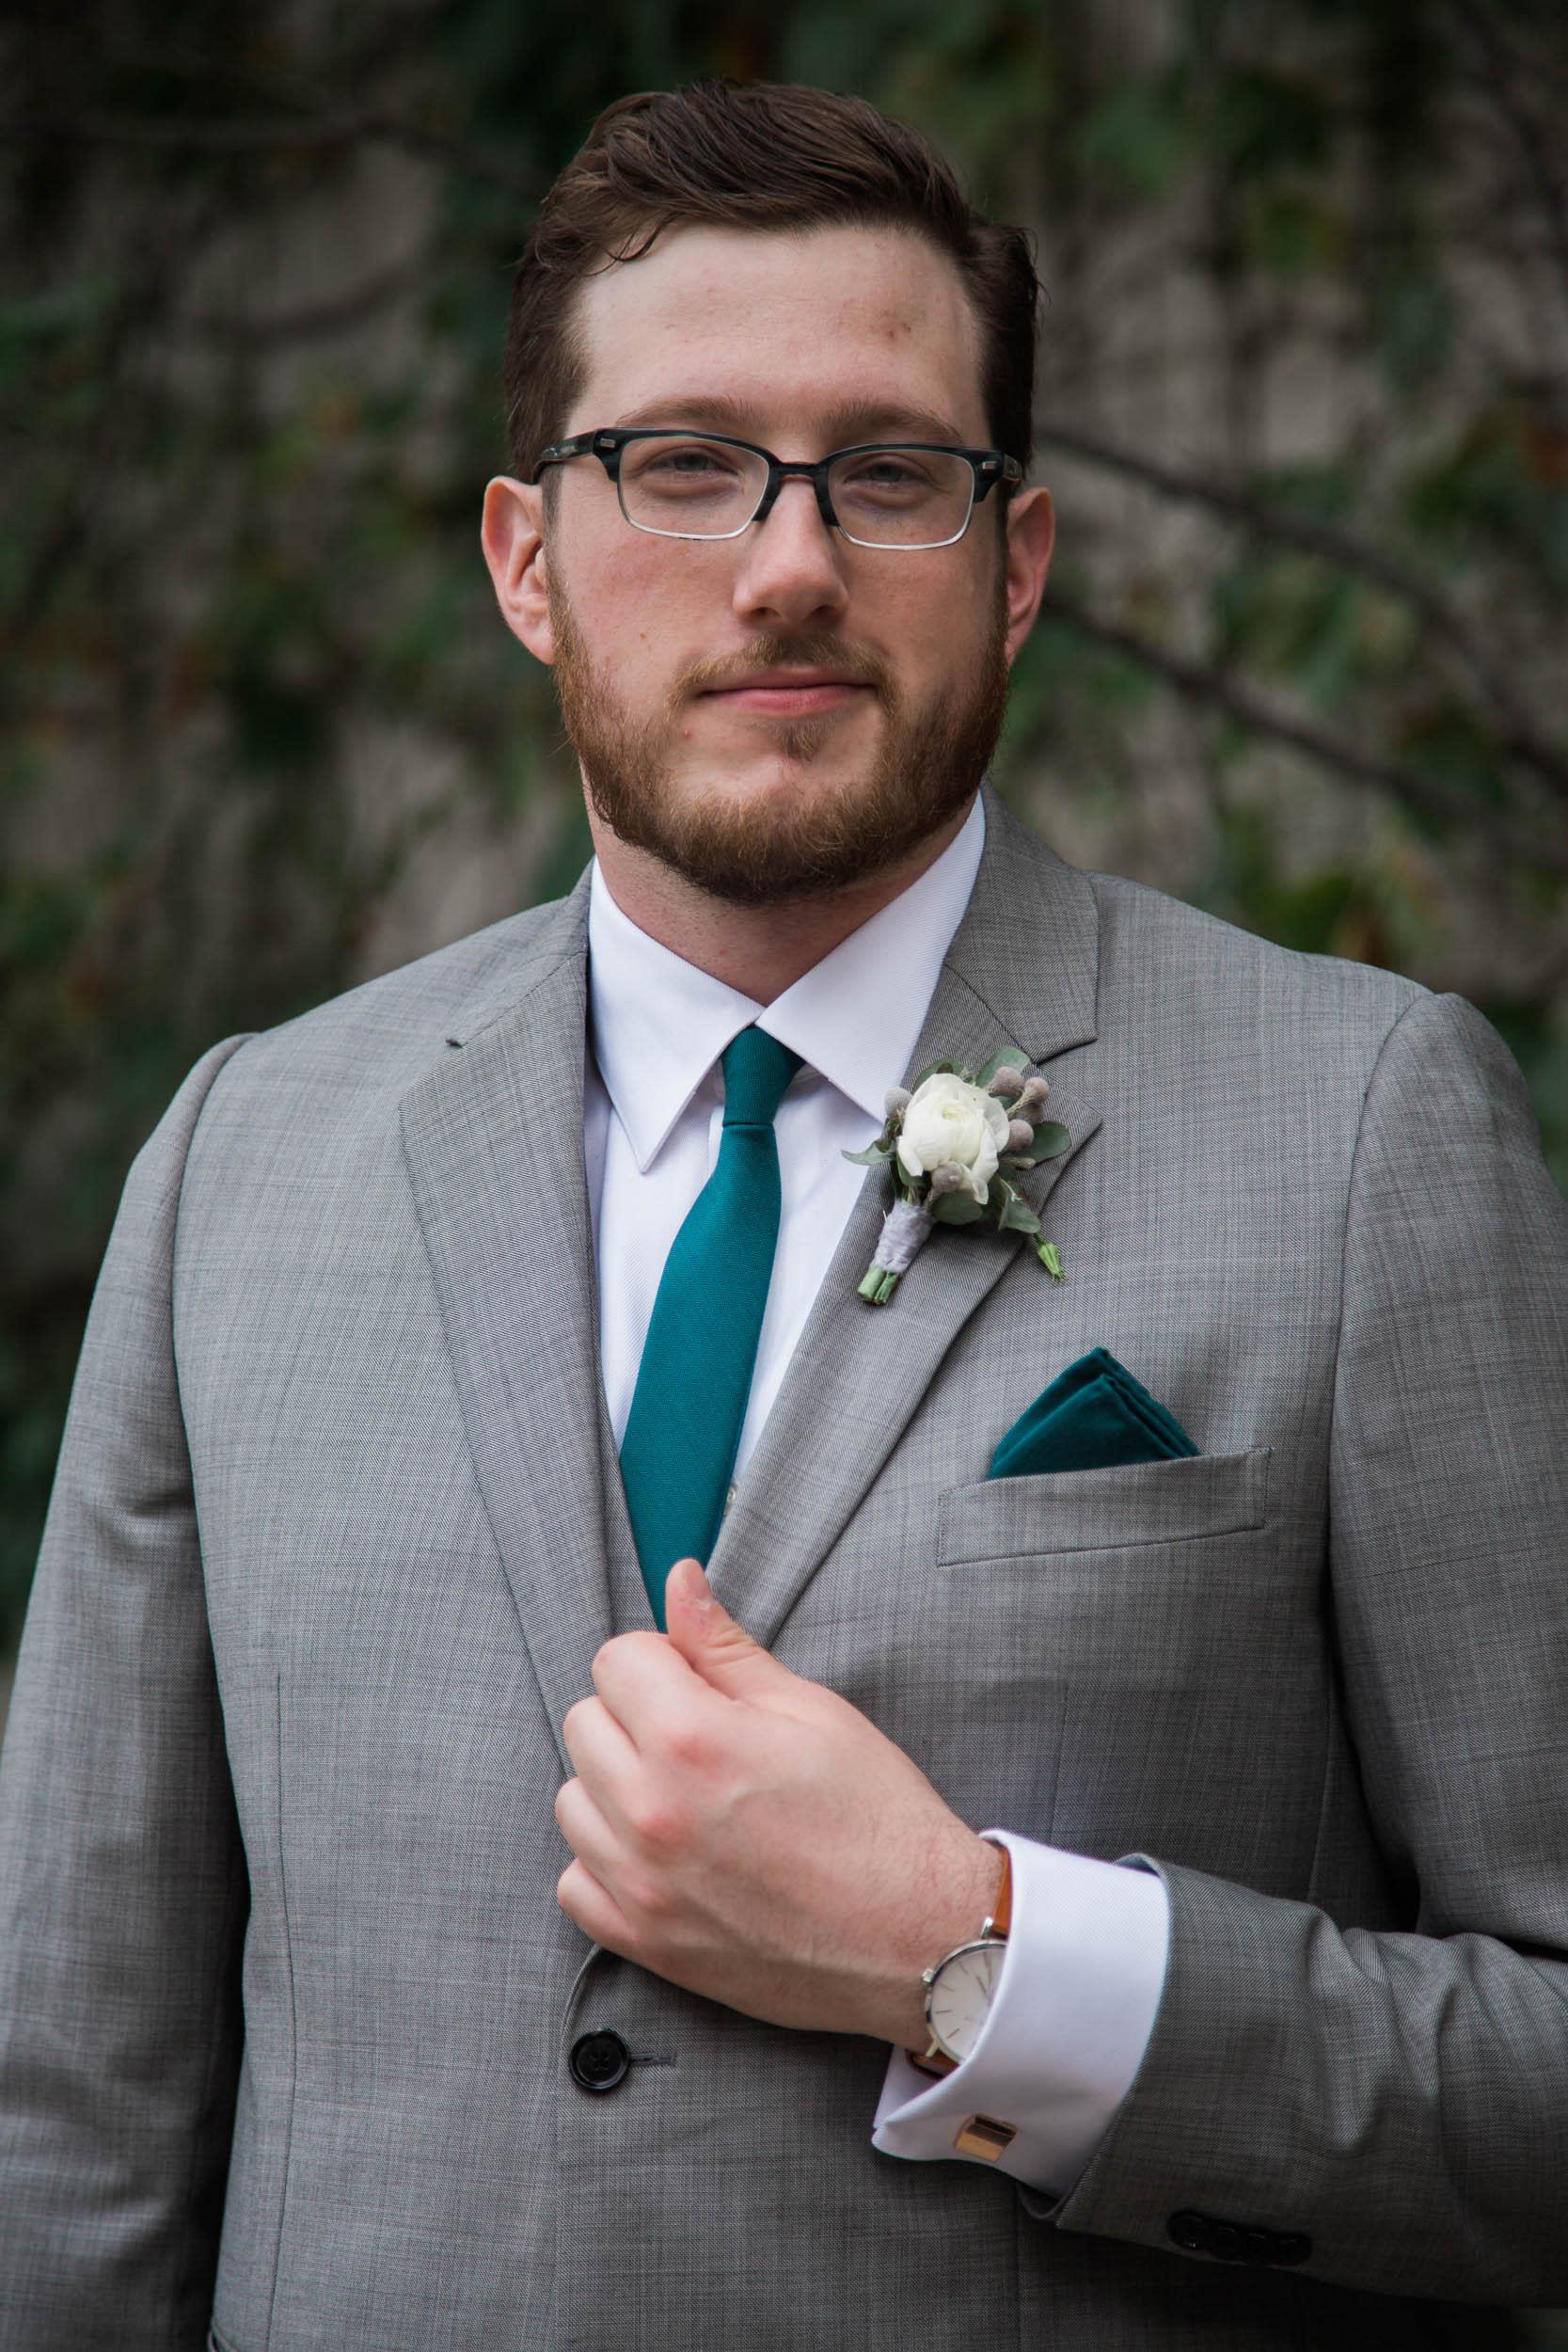 Chicago Wedding - Groom Style